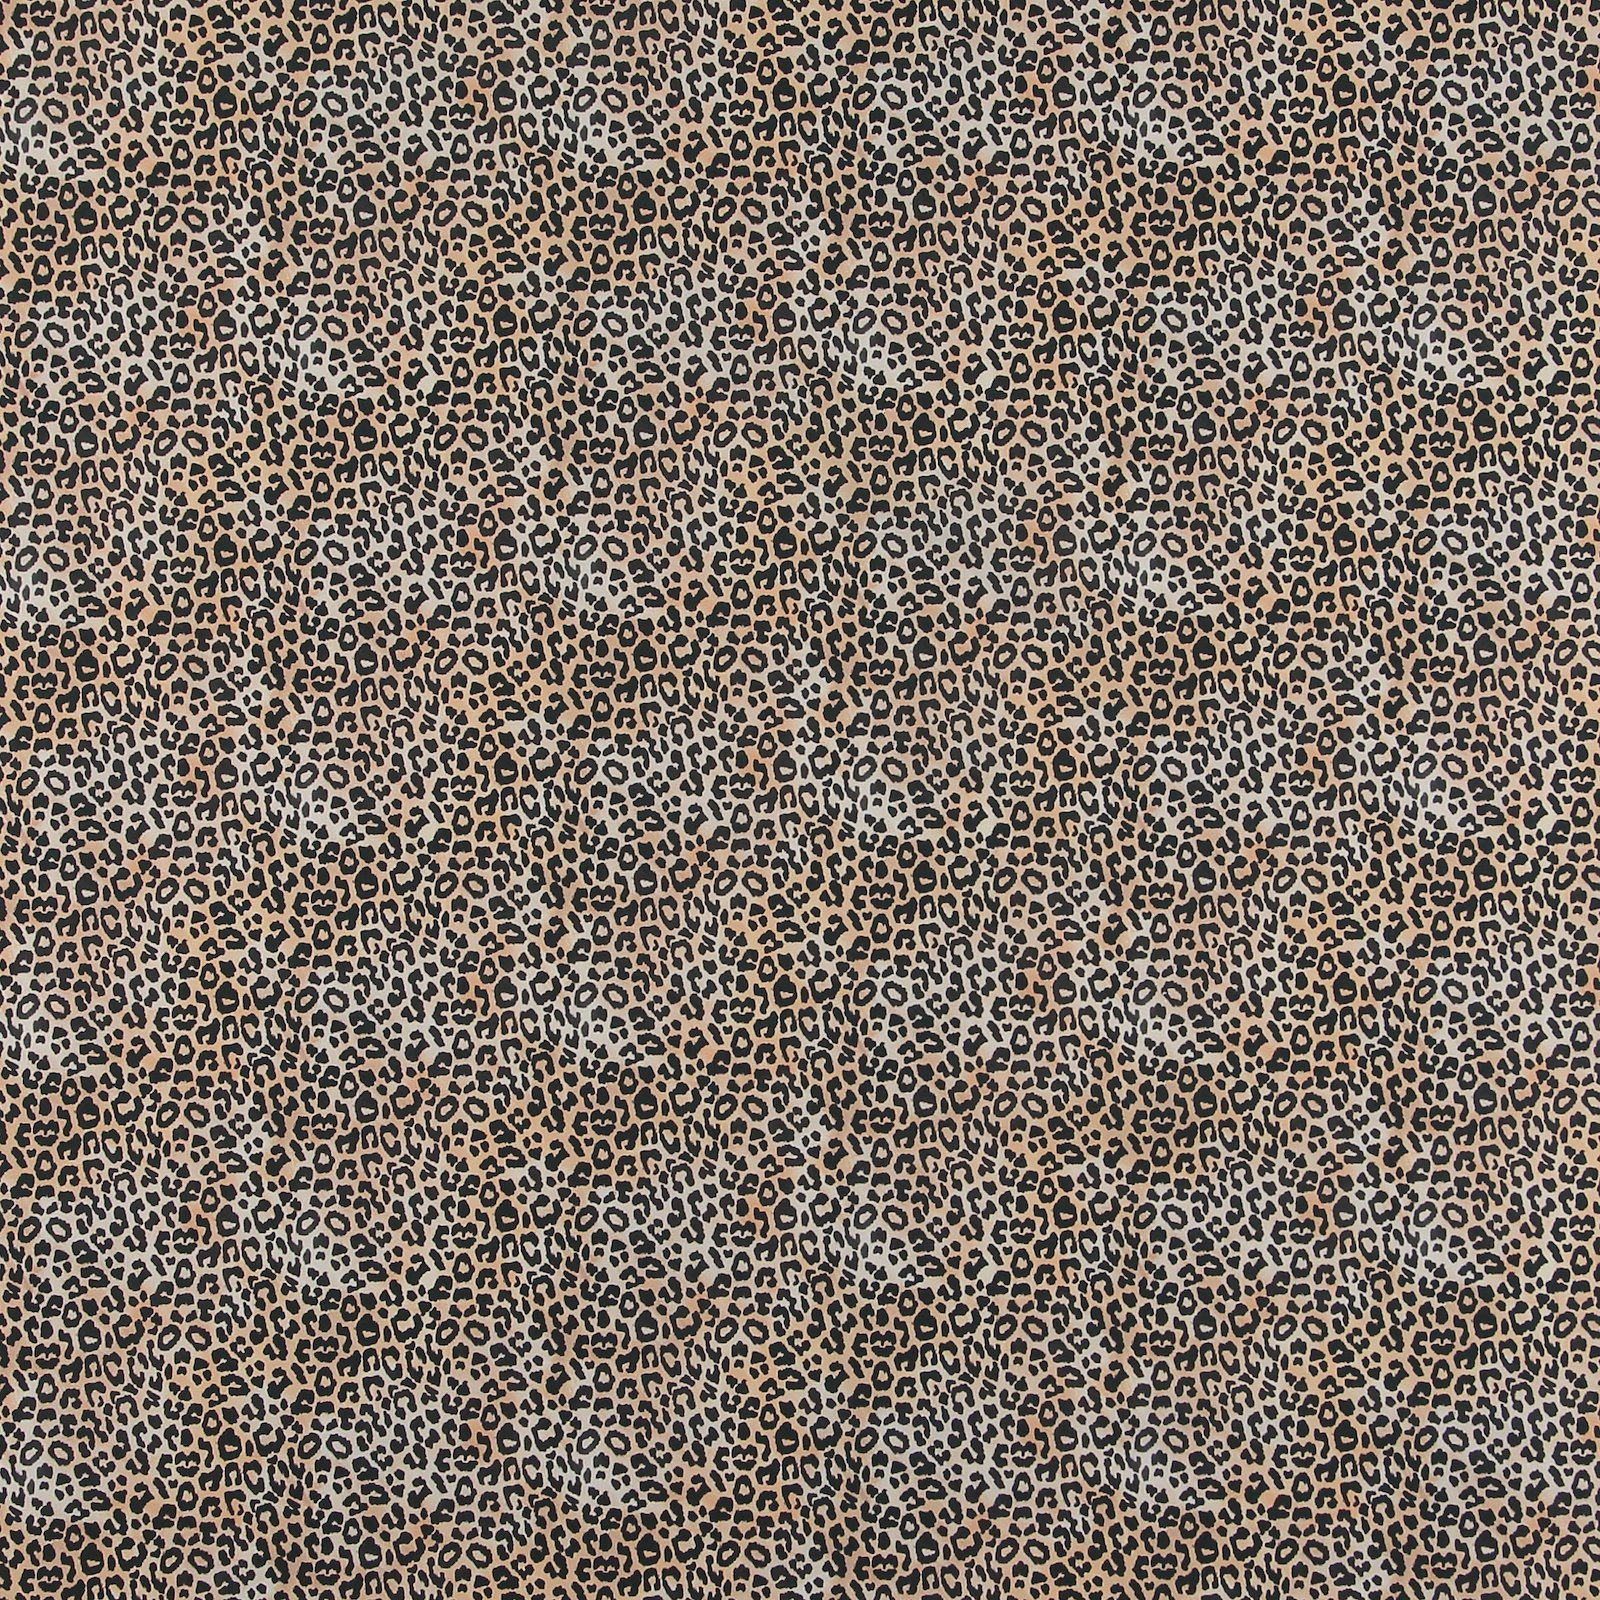 Cotton poplin beige w animal print 540125_pack_sp